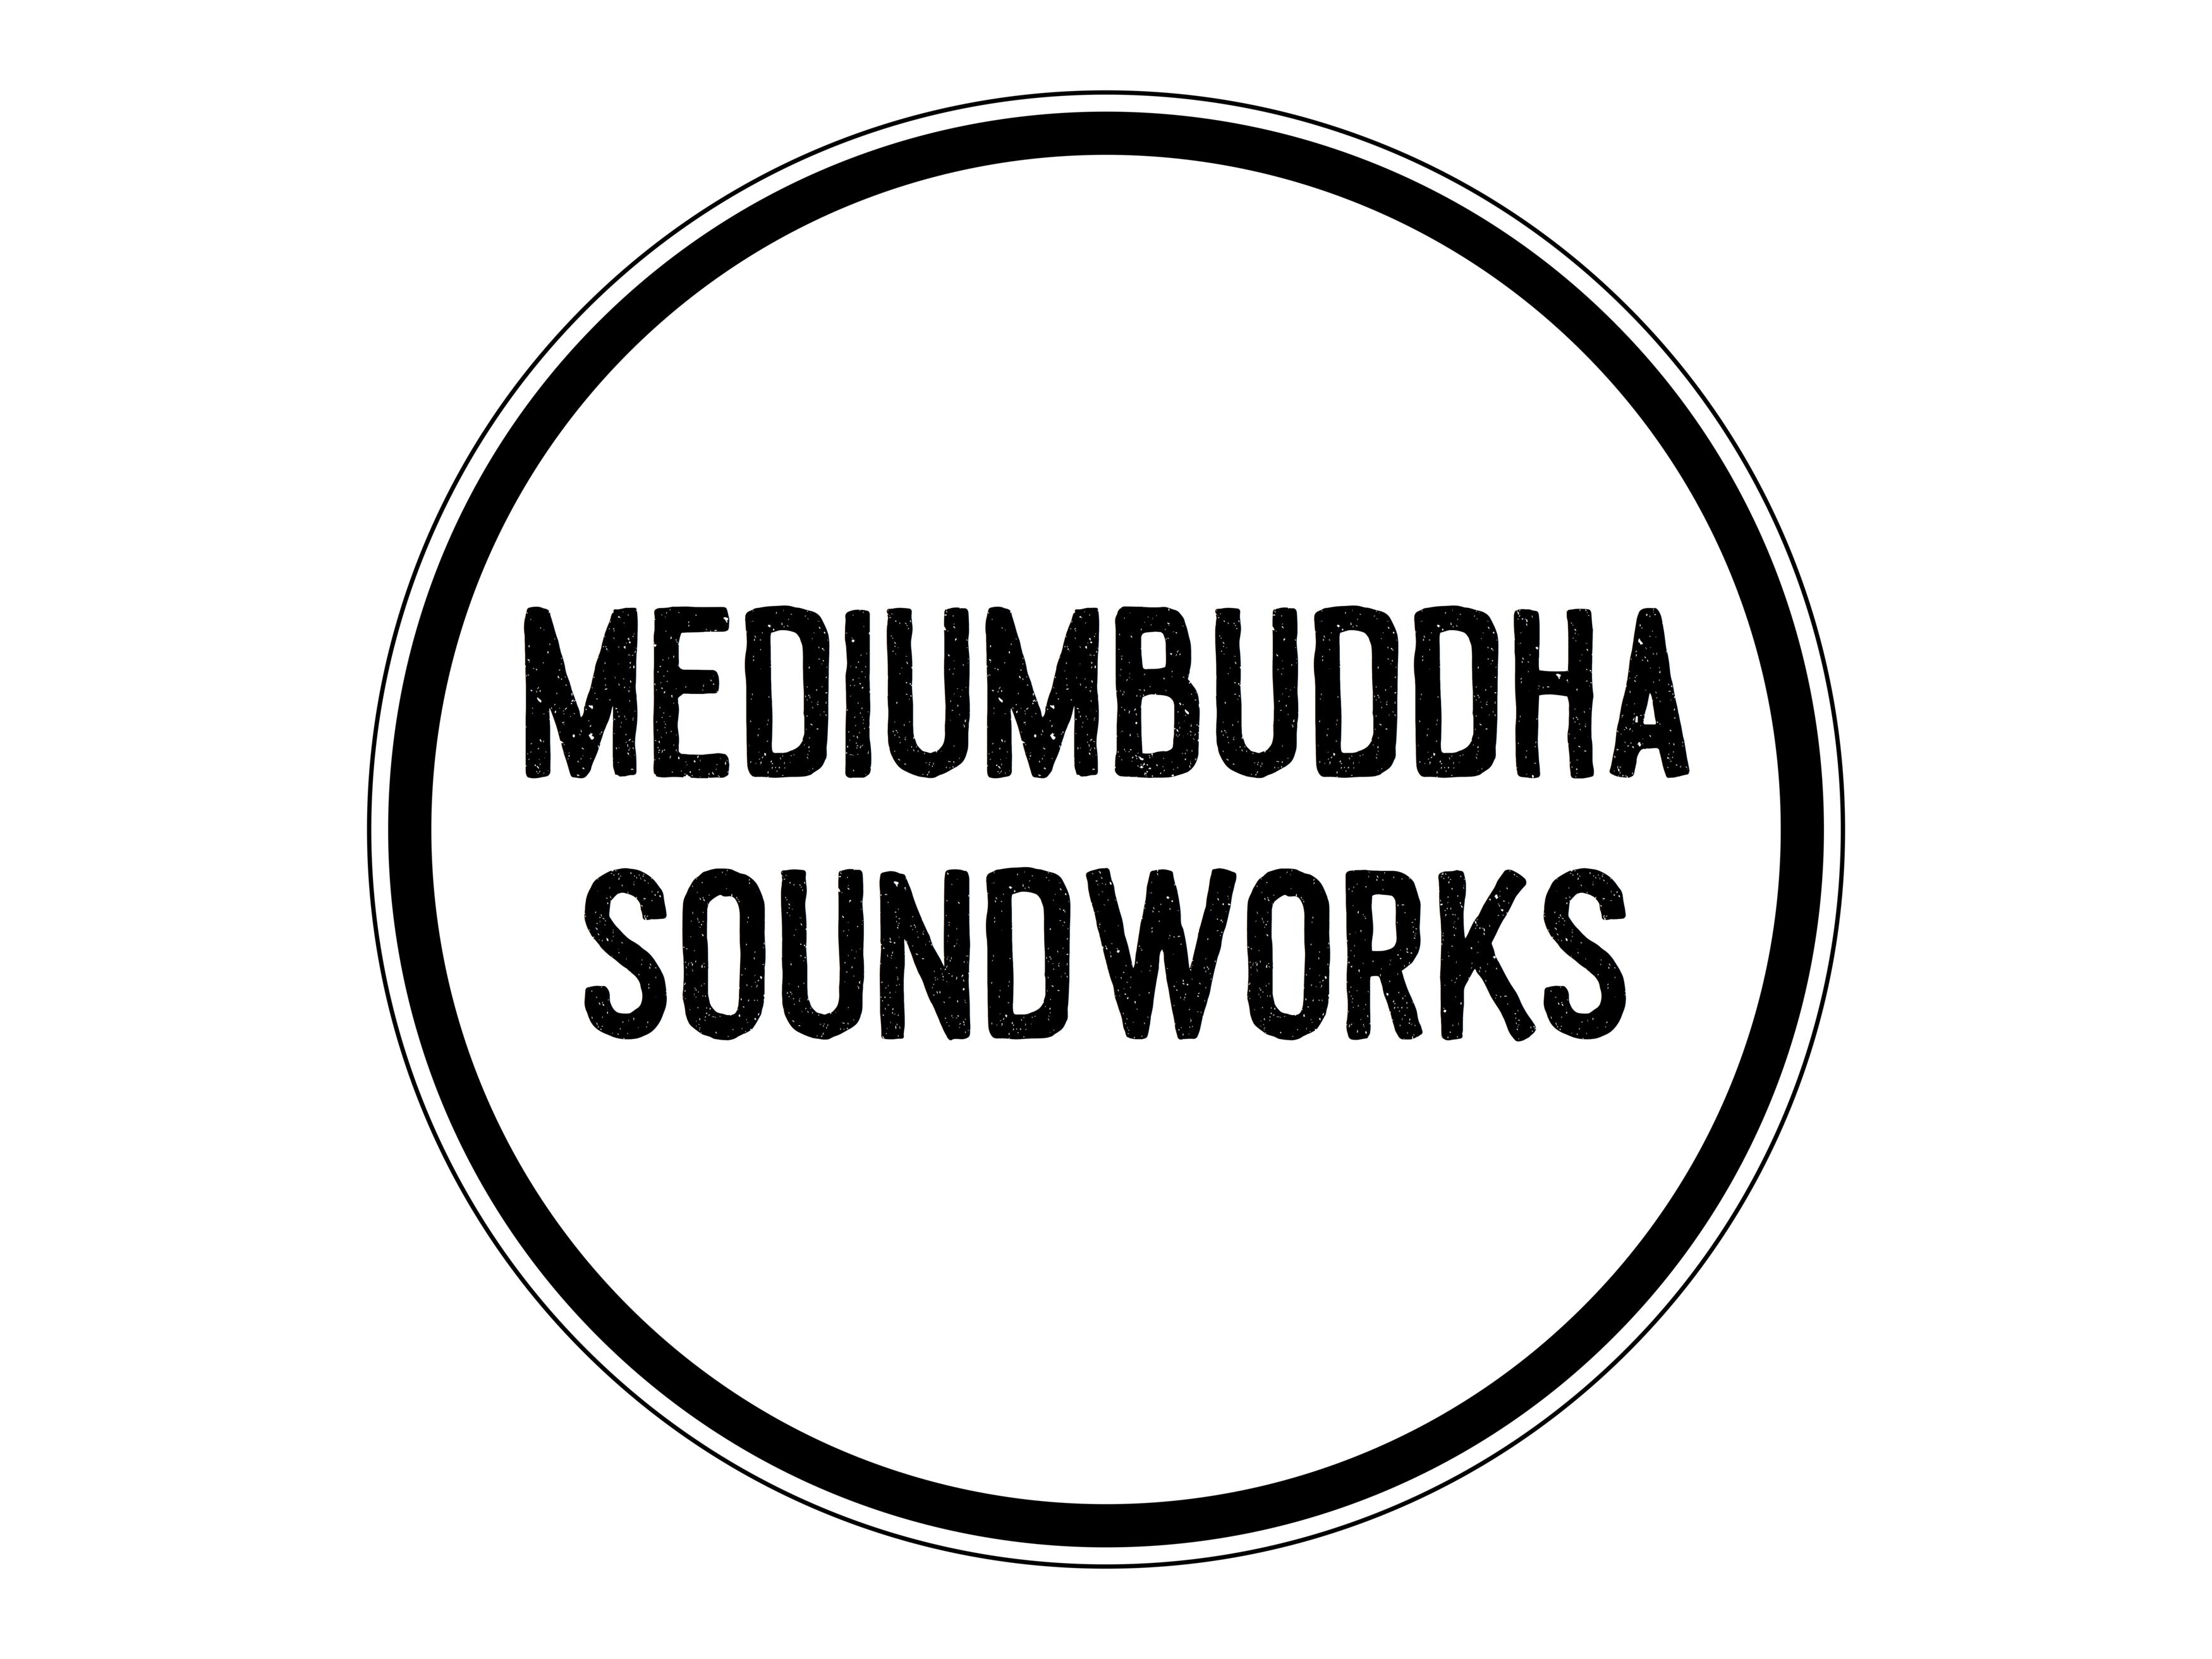 MEDIUMBUDDHA SOUNDWORKS